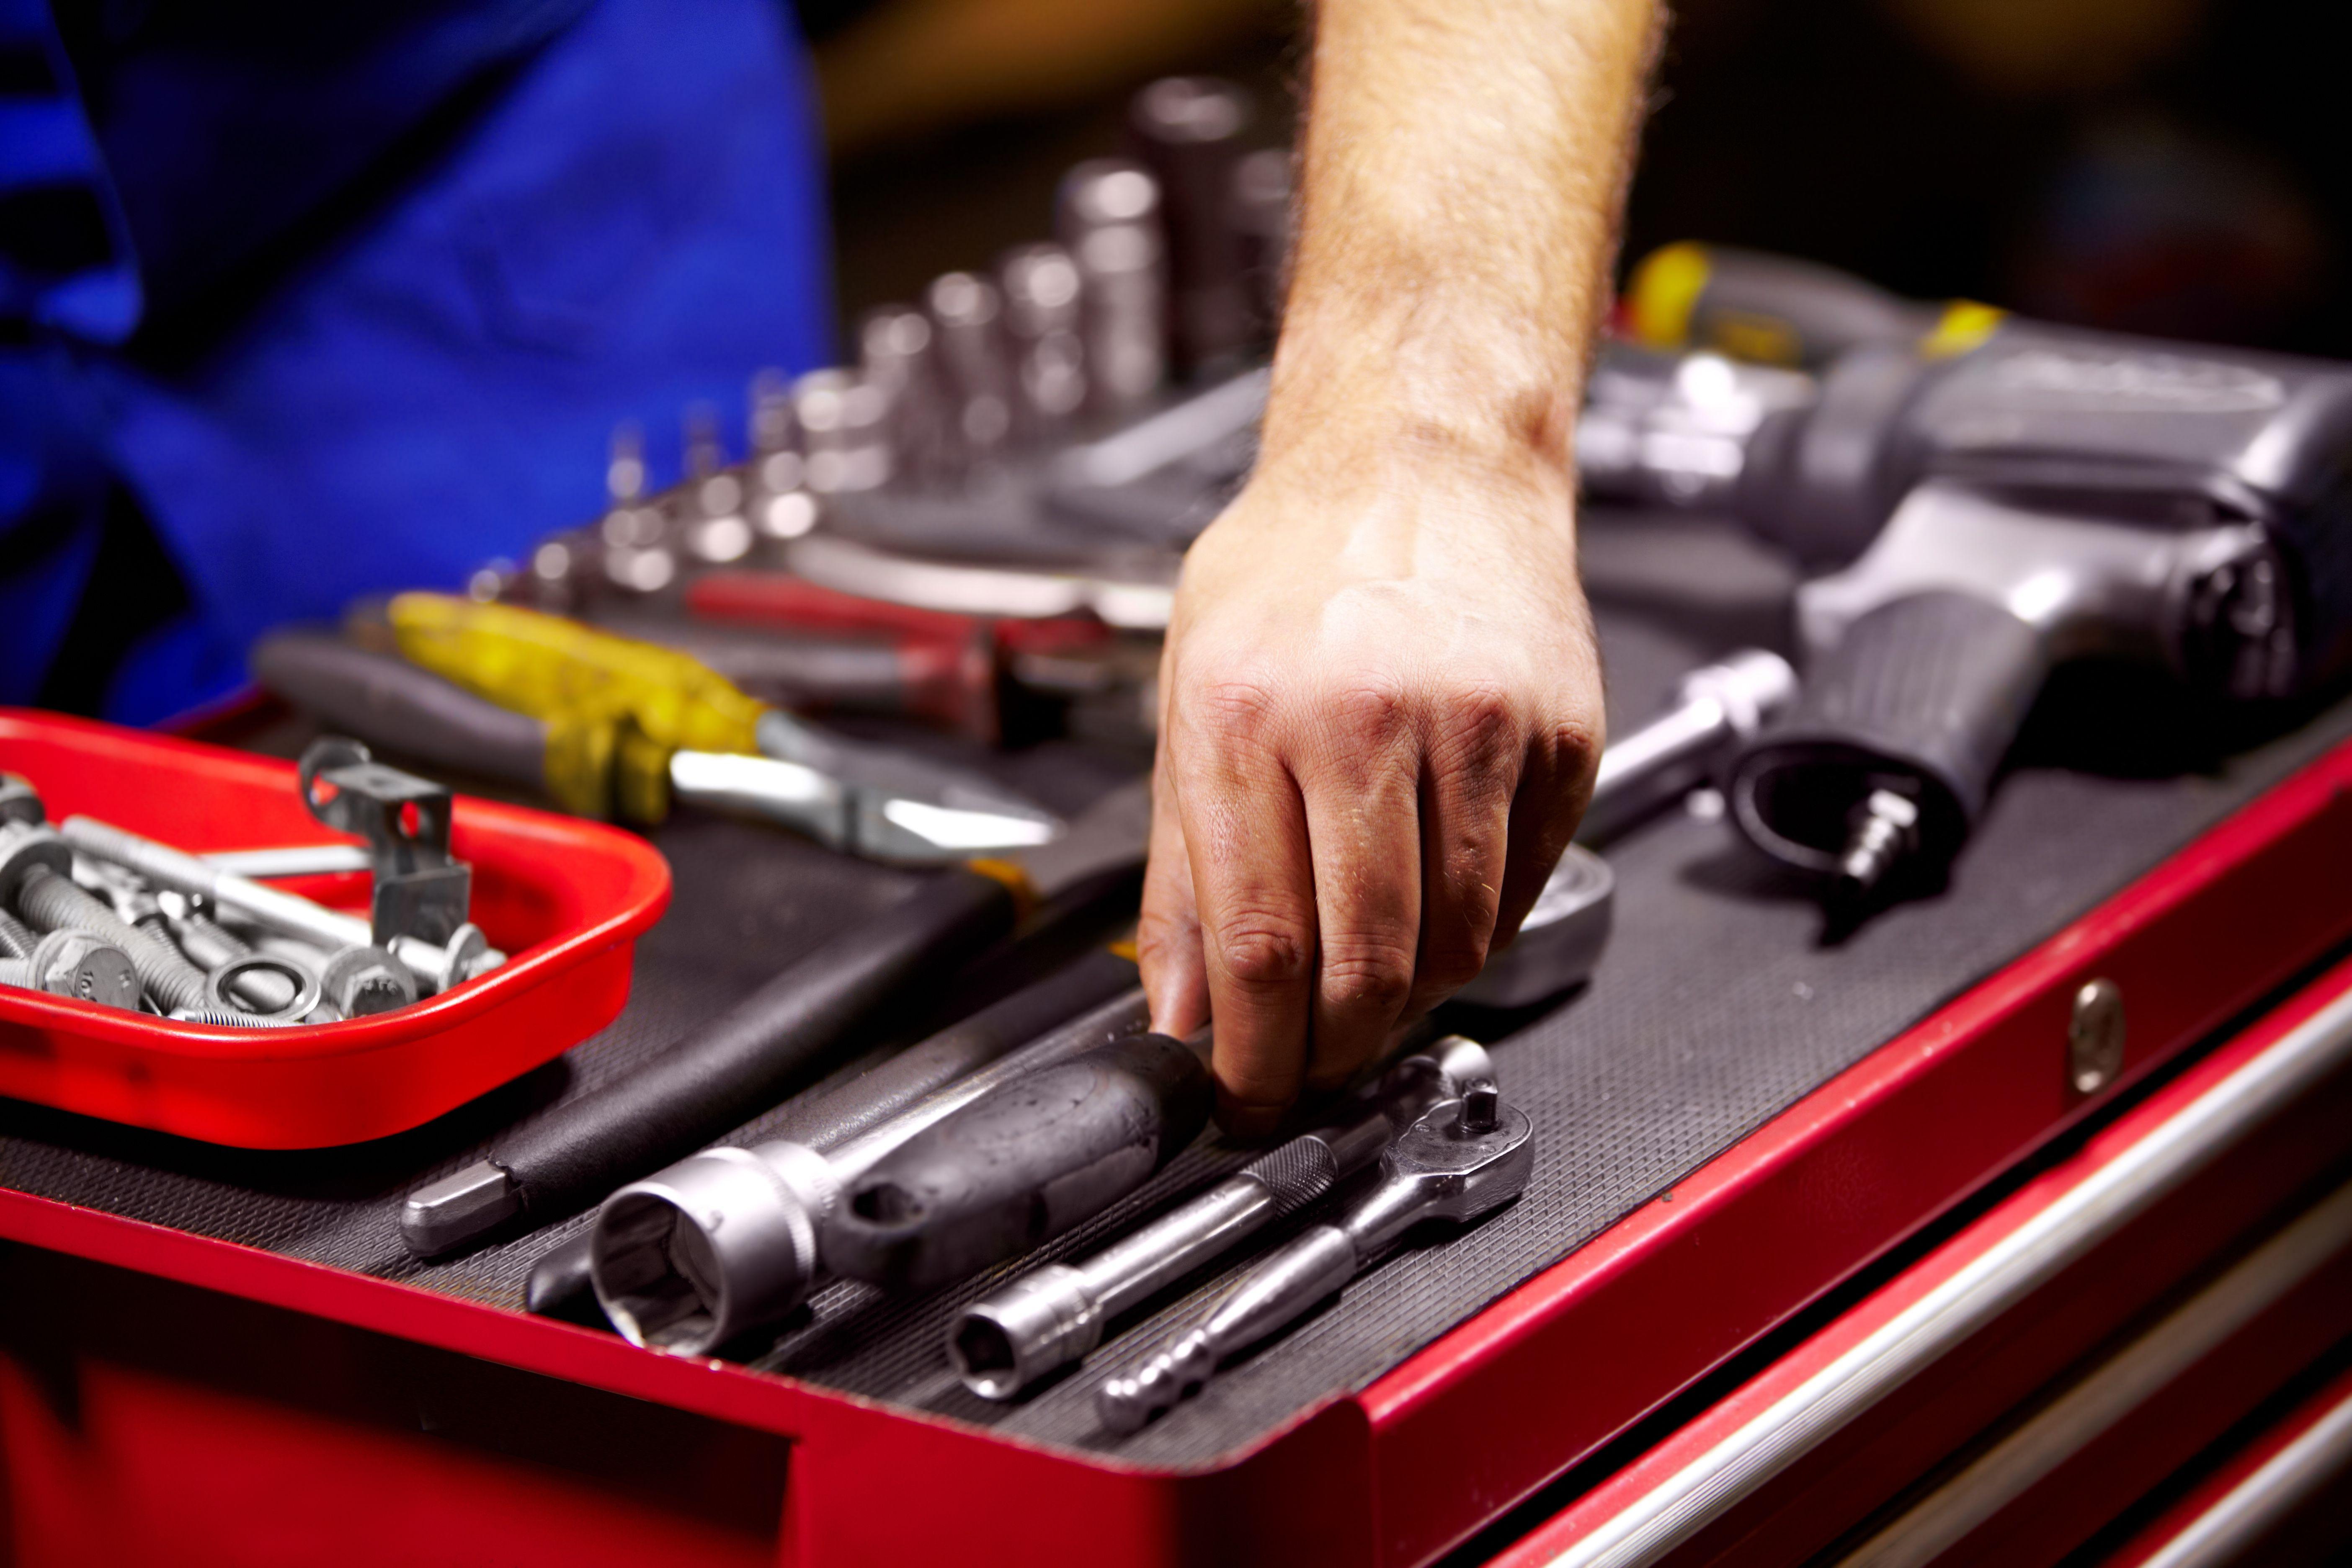 Taller mecánico en Lleida con un servicio de calidad